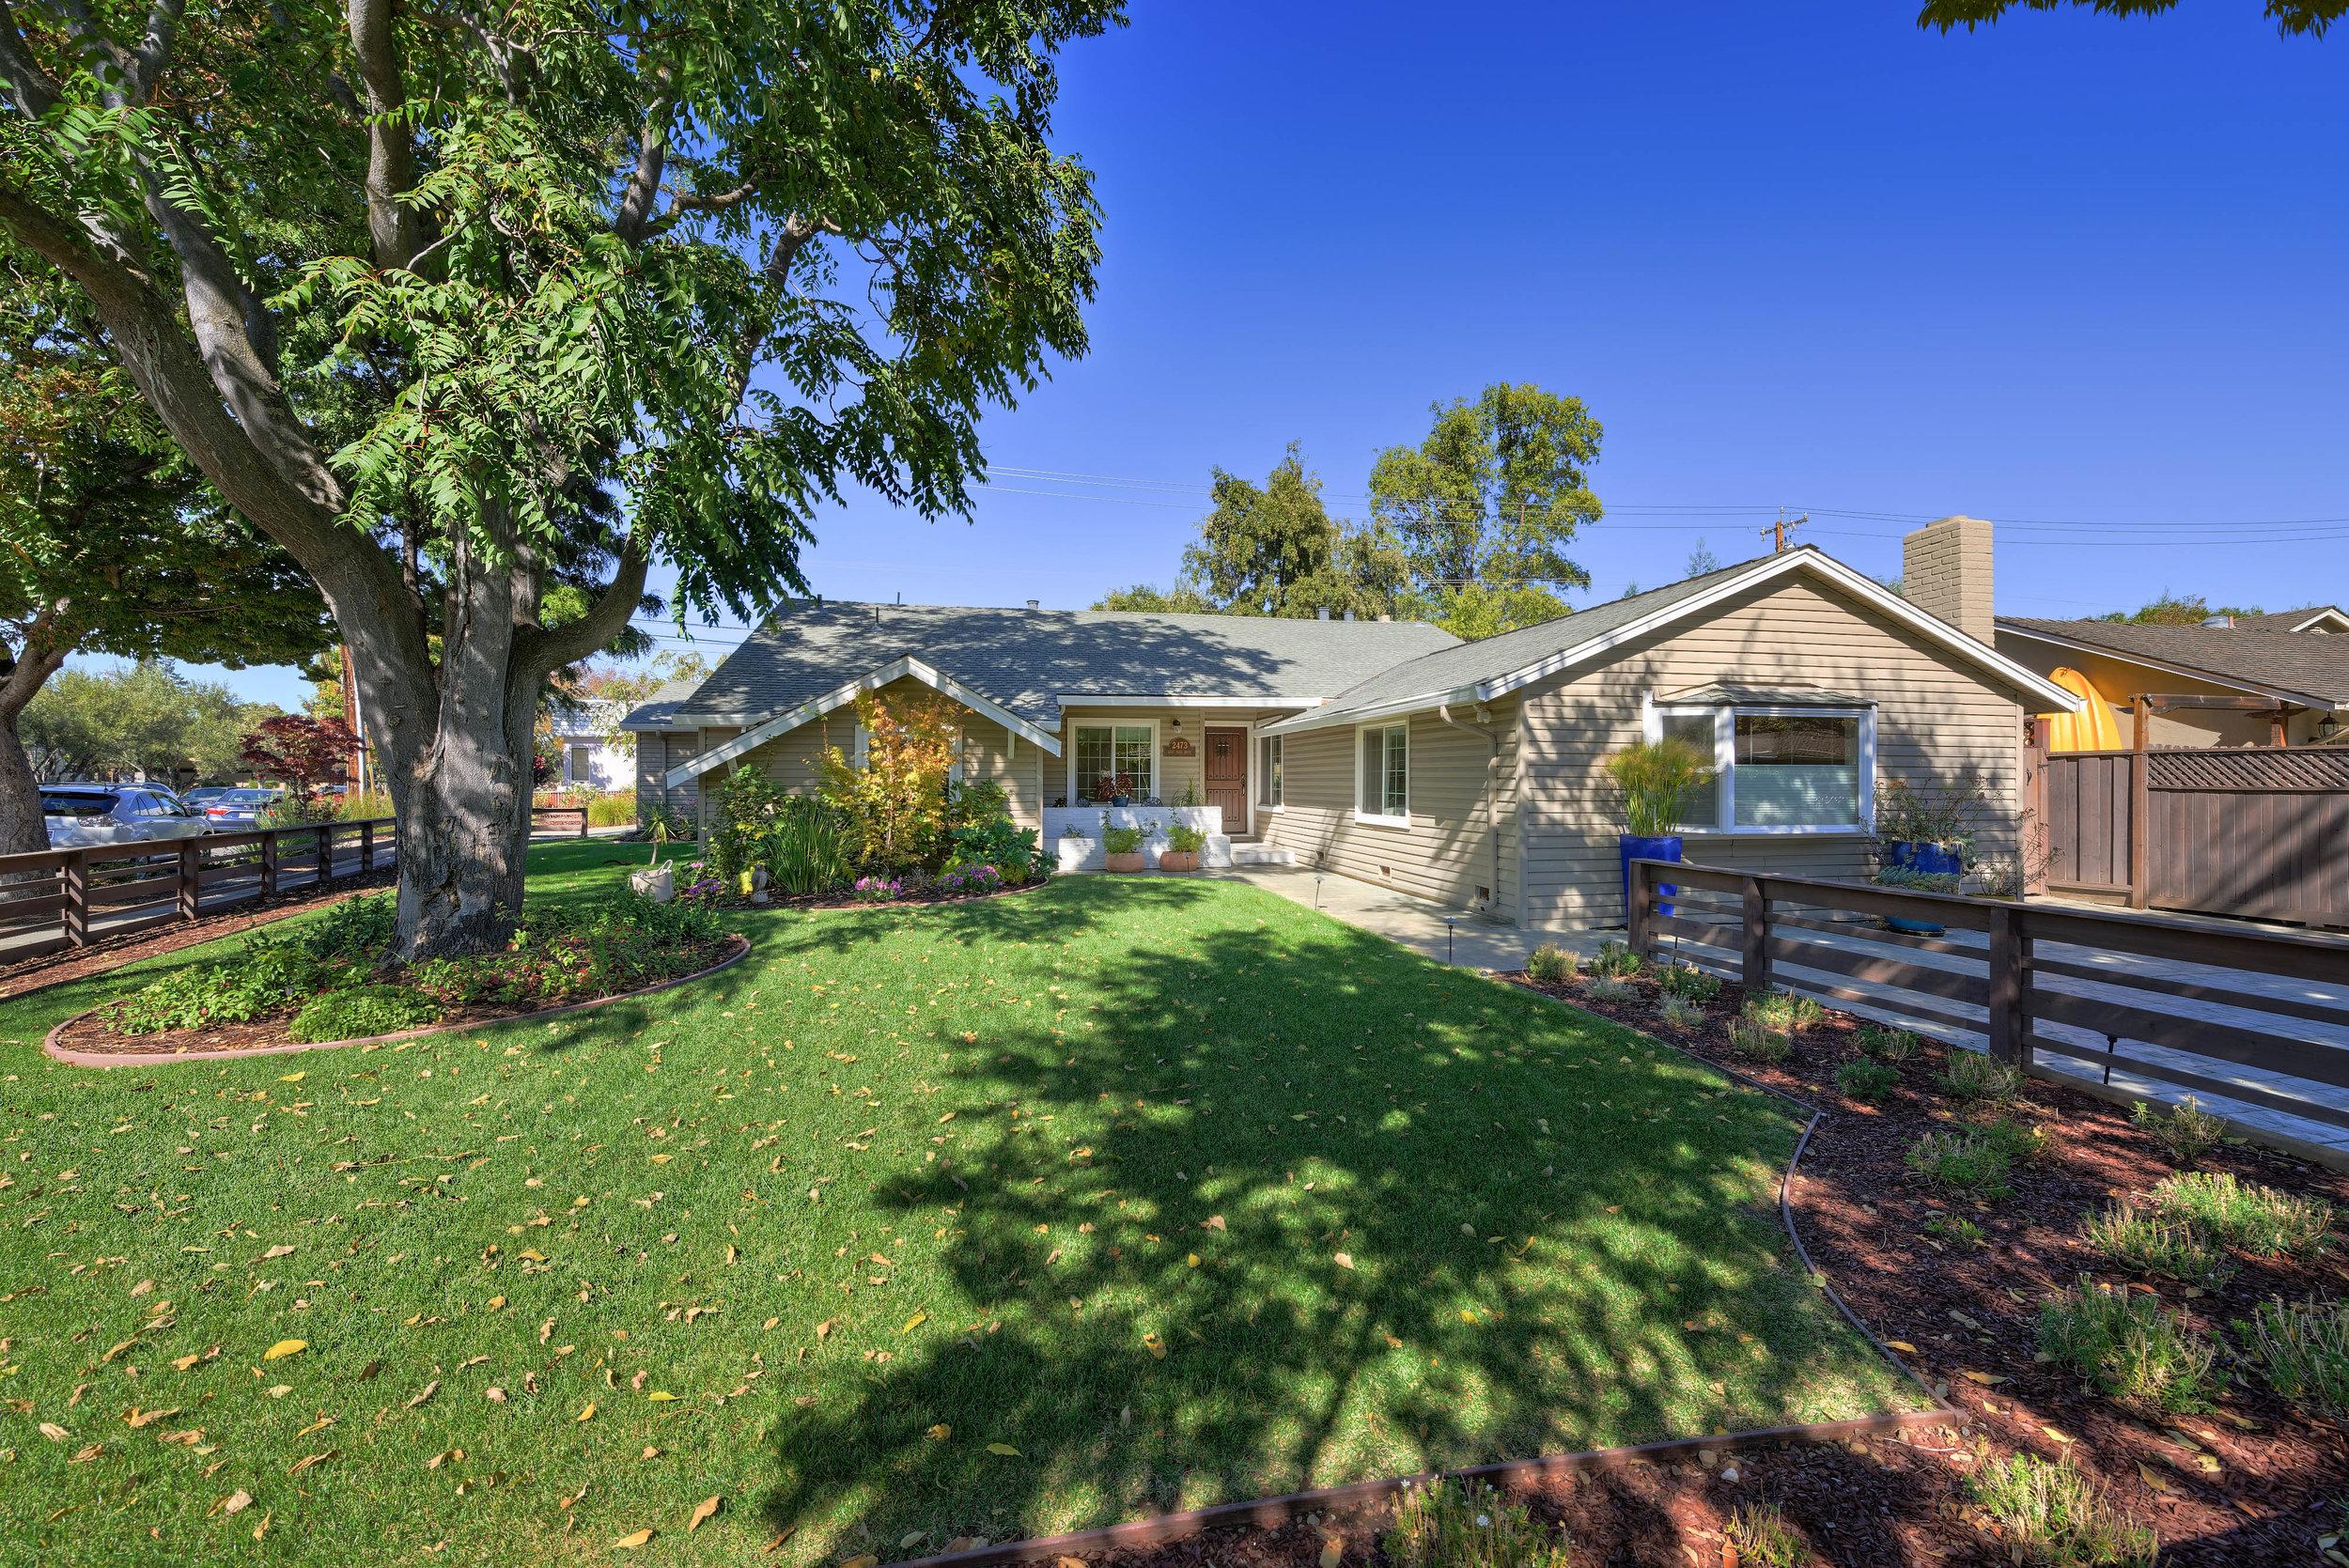 2473 Lost Oaks Drive, San Jose  4 bedrooms • 2 bathrooms • 1,880 sq ft interior